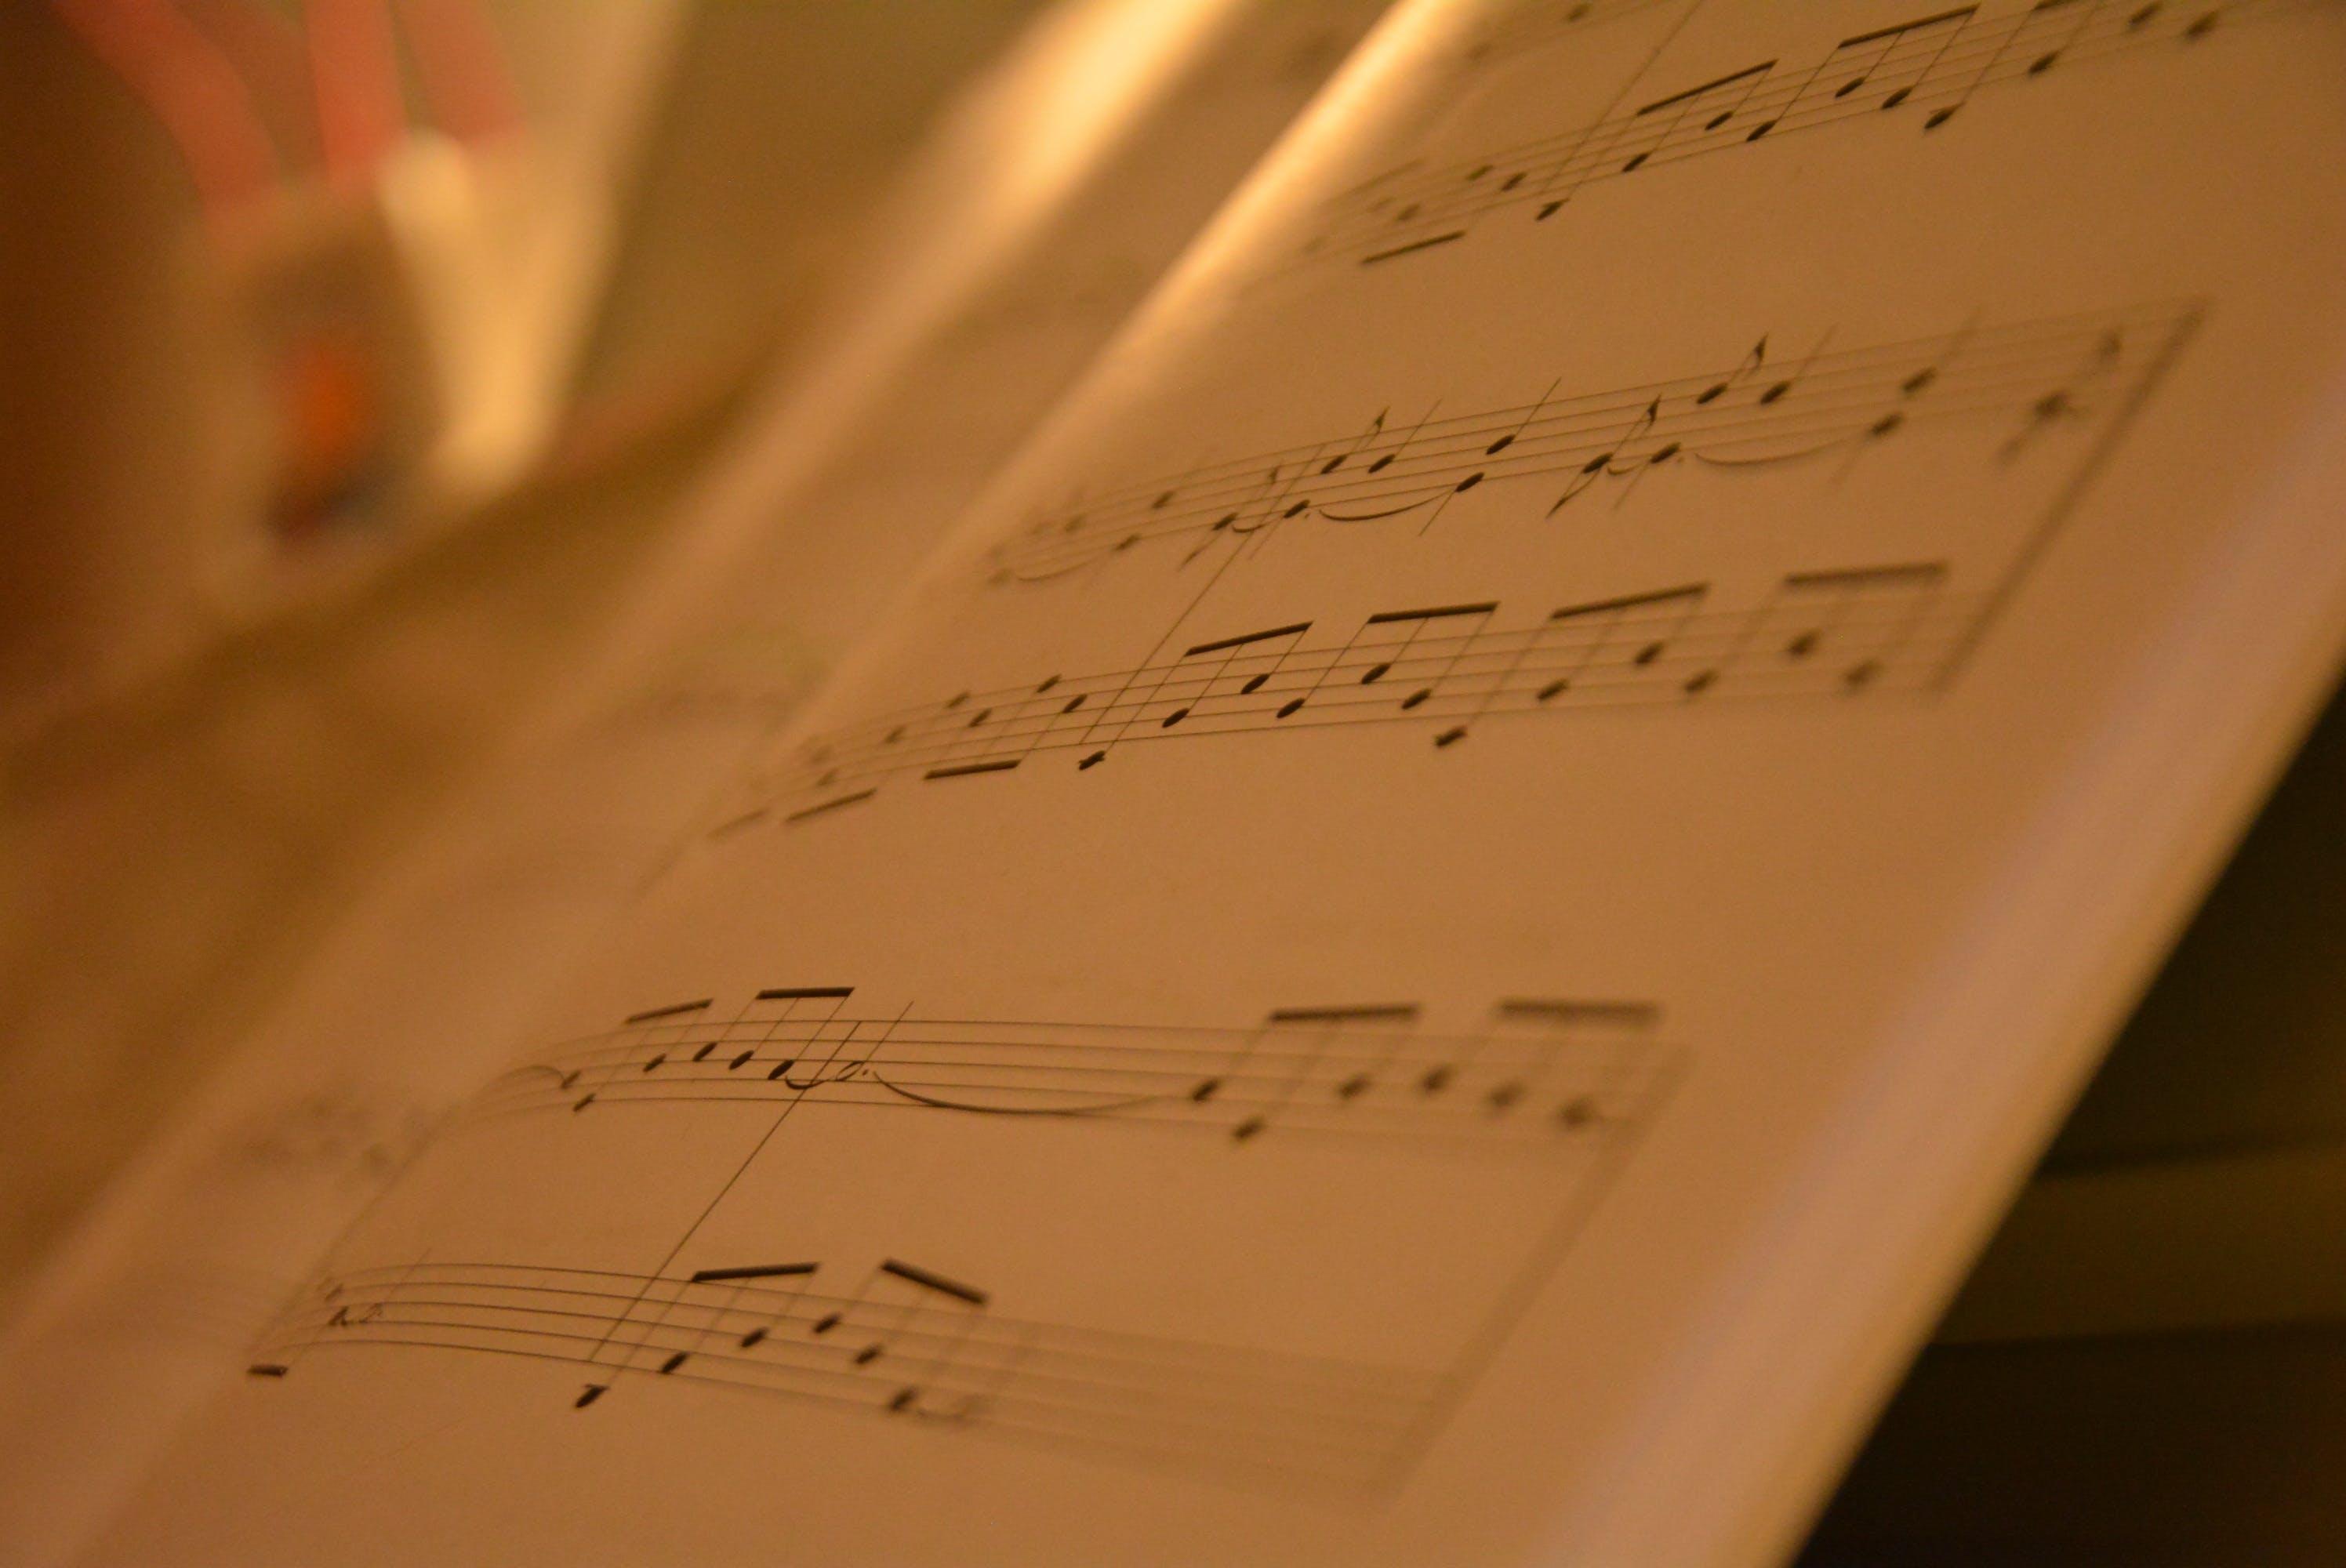 book, close-up, music